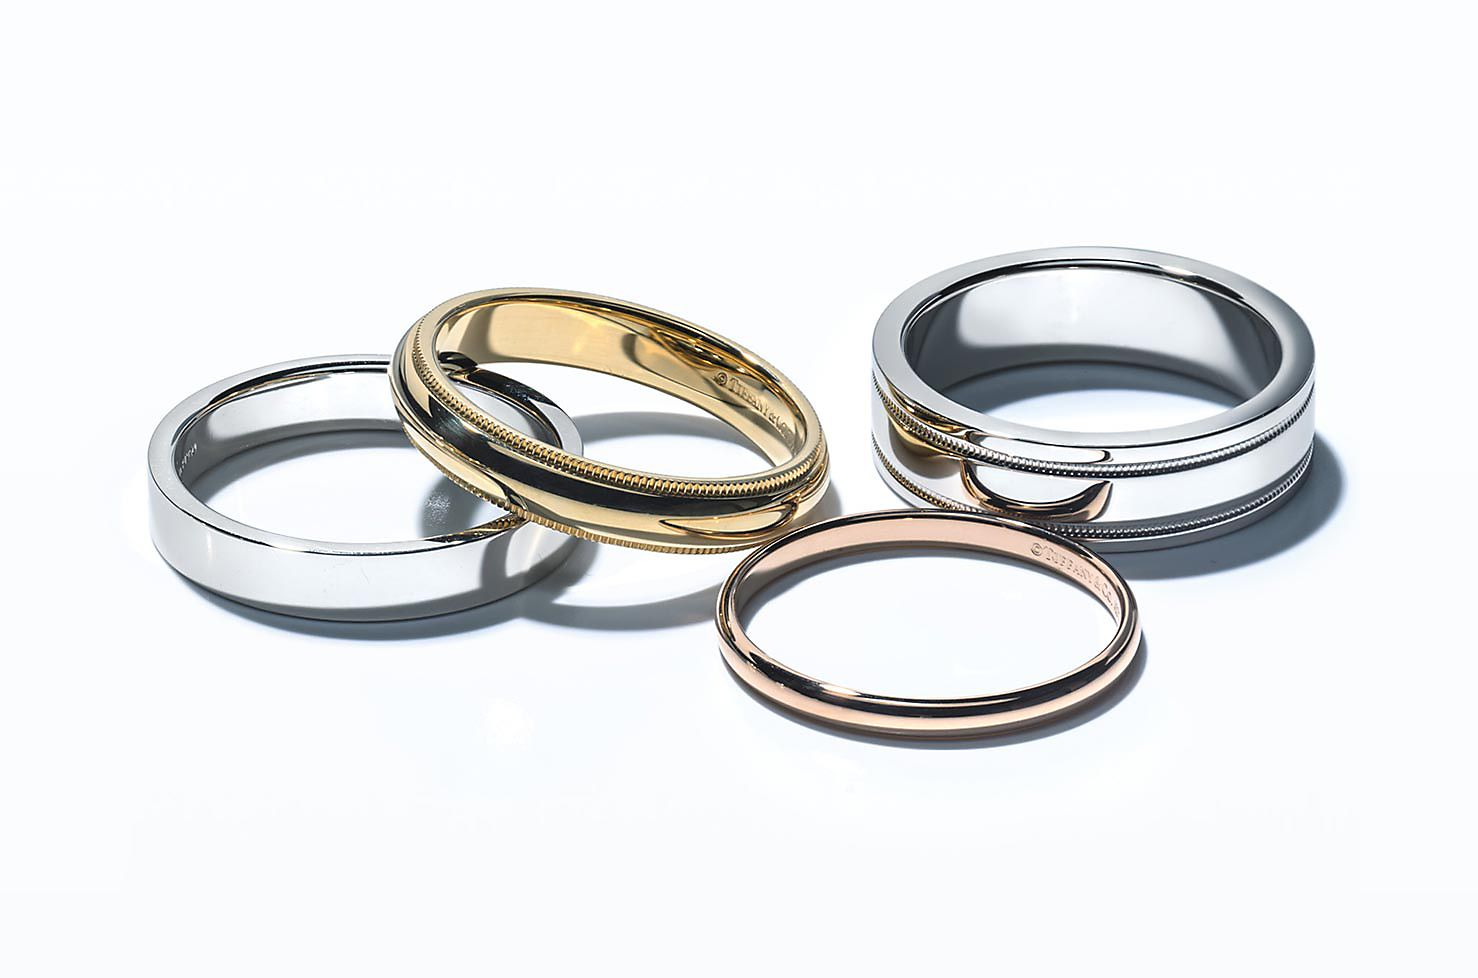 Tiffany Wedding Bands with Diamonds